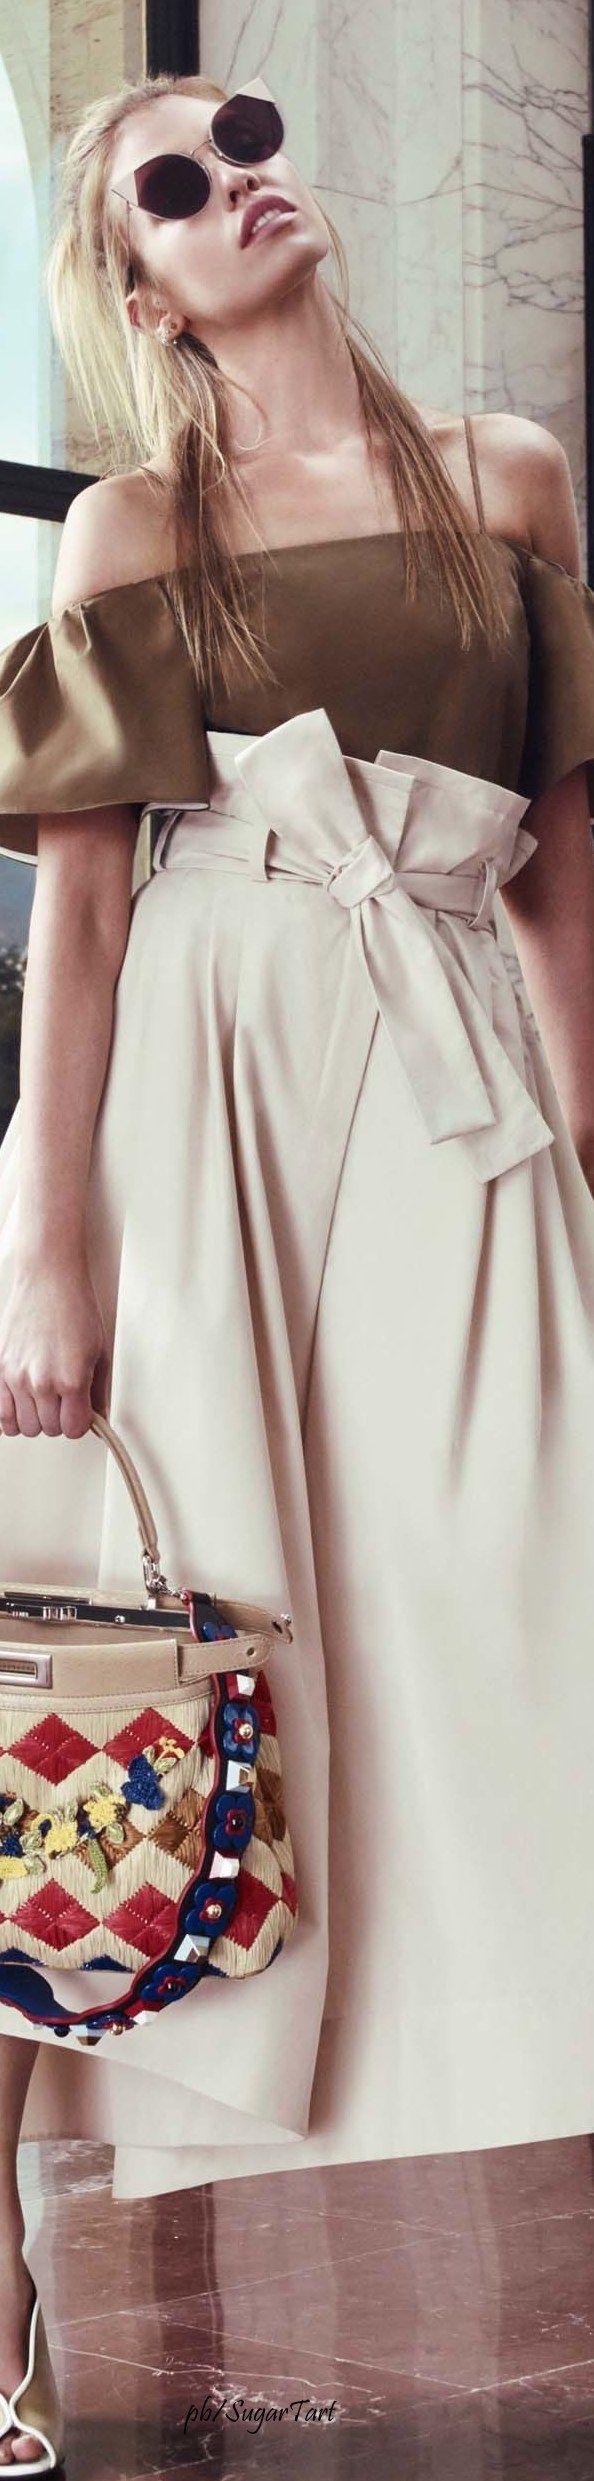 :Fendi Resort 2017...paper bag waist pants are back...love them: